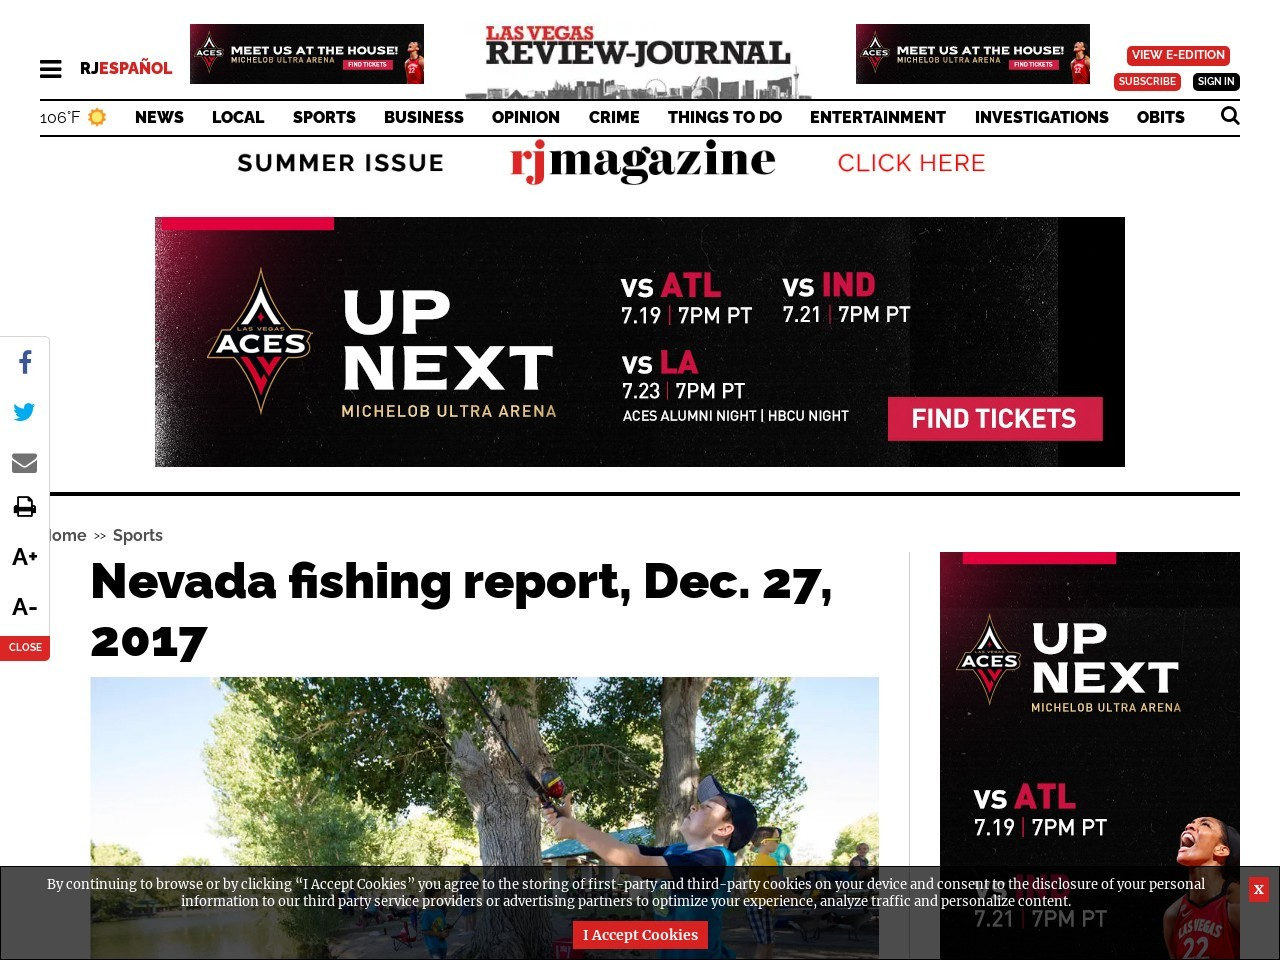 Nevada fishing report, Dec. 27, 2017